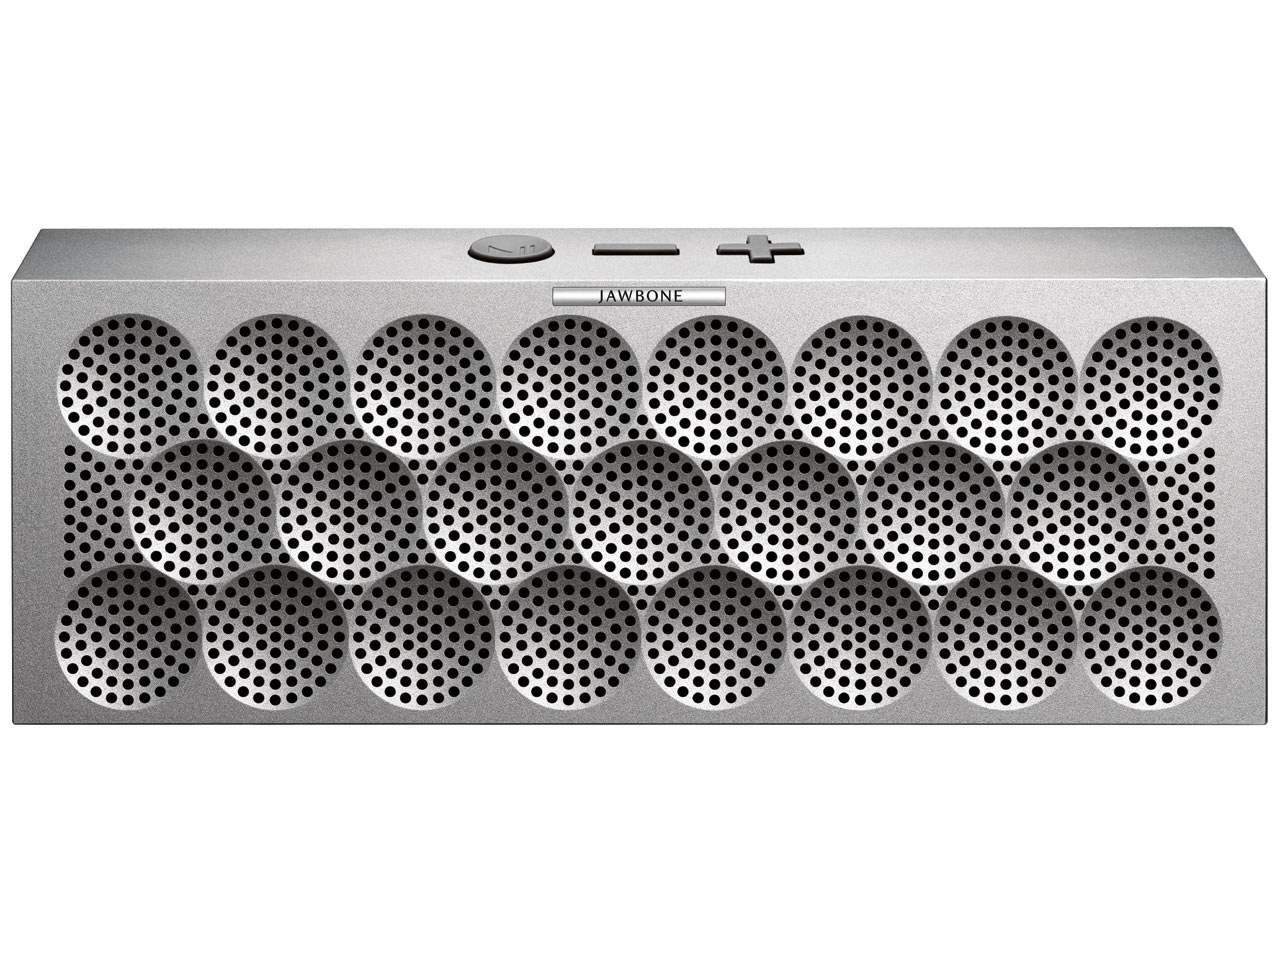 MINI-JAMBOX-Jawbone-9-silver